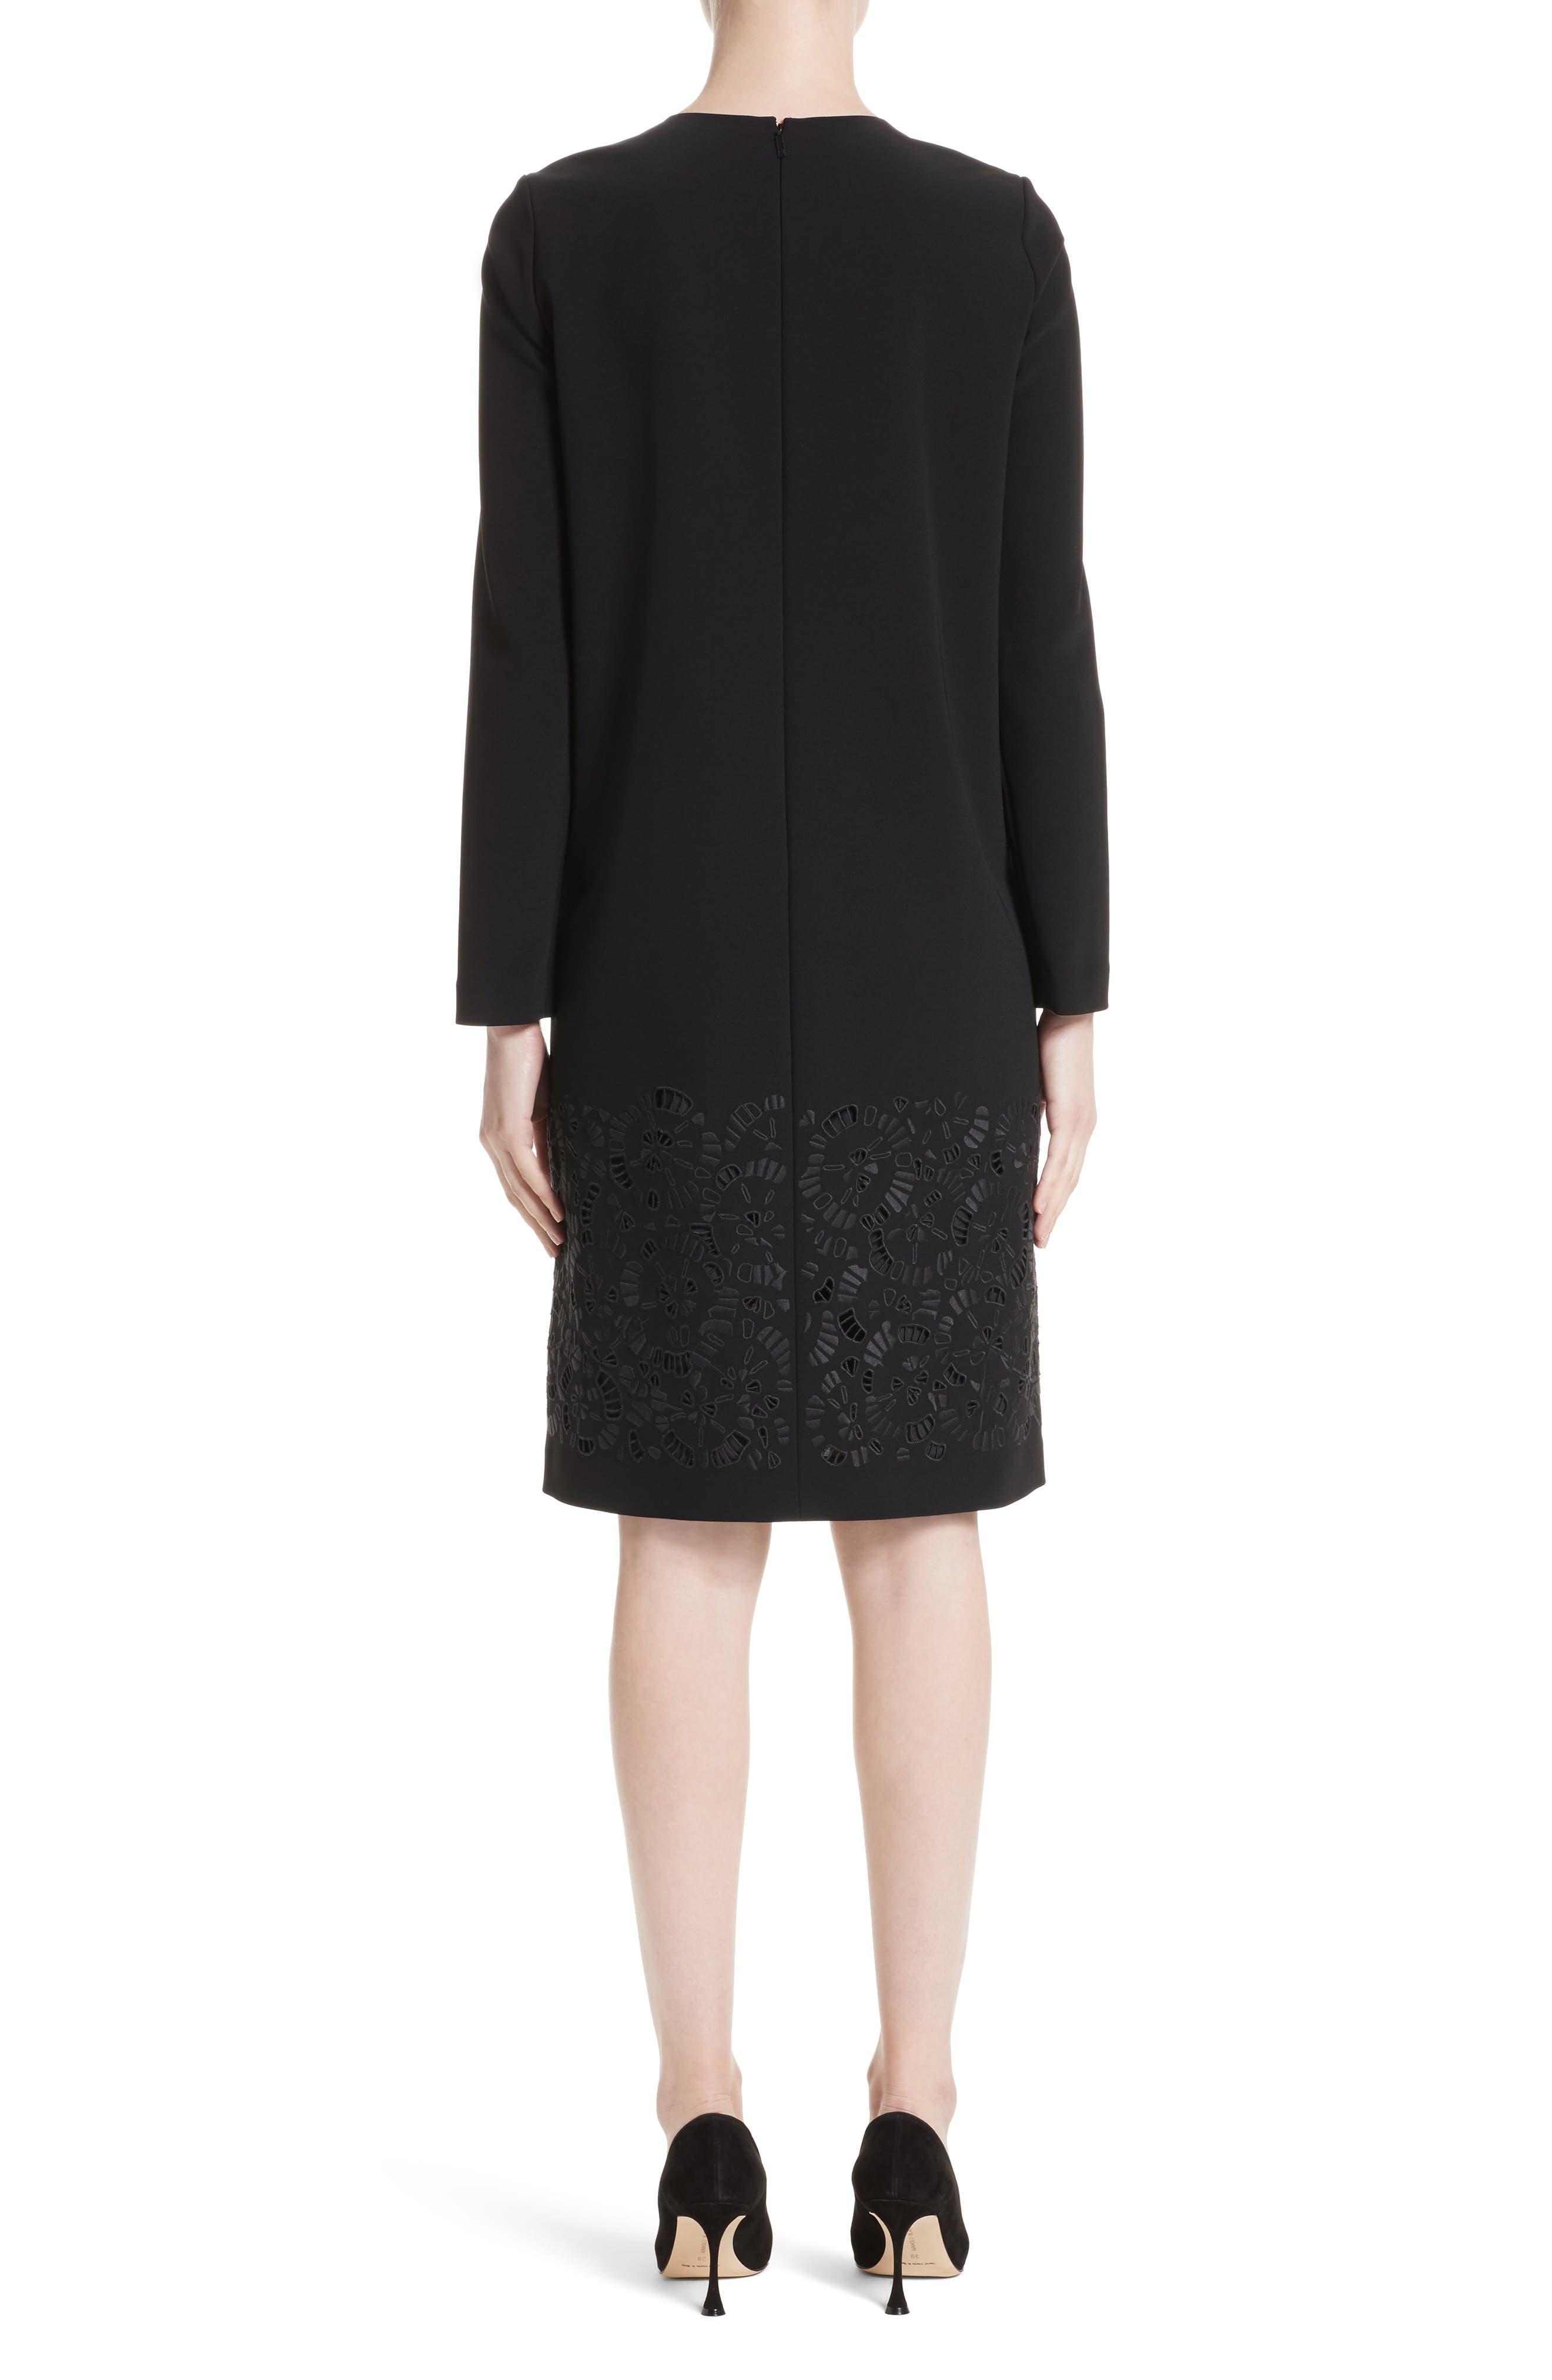 Corbin Embroidered Laser Cut Dress,                             Alternate thumbnail 2, color,                             Black